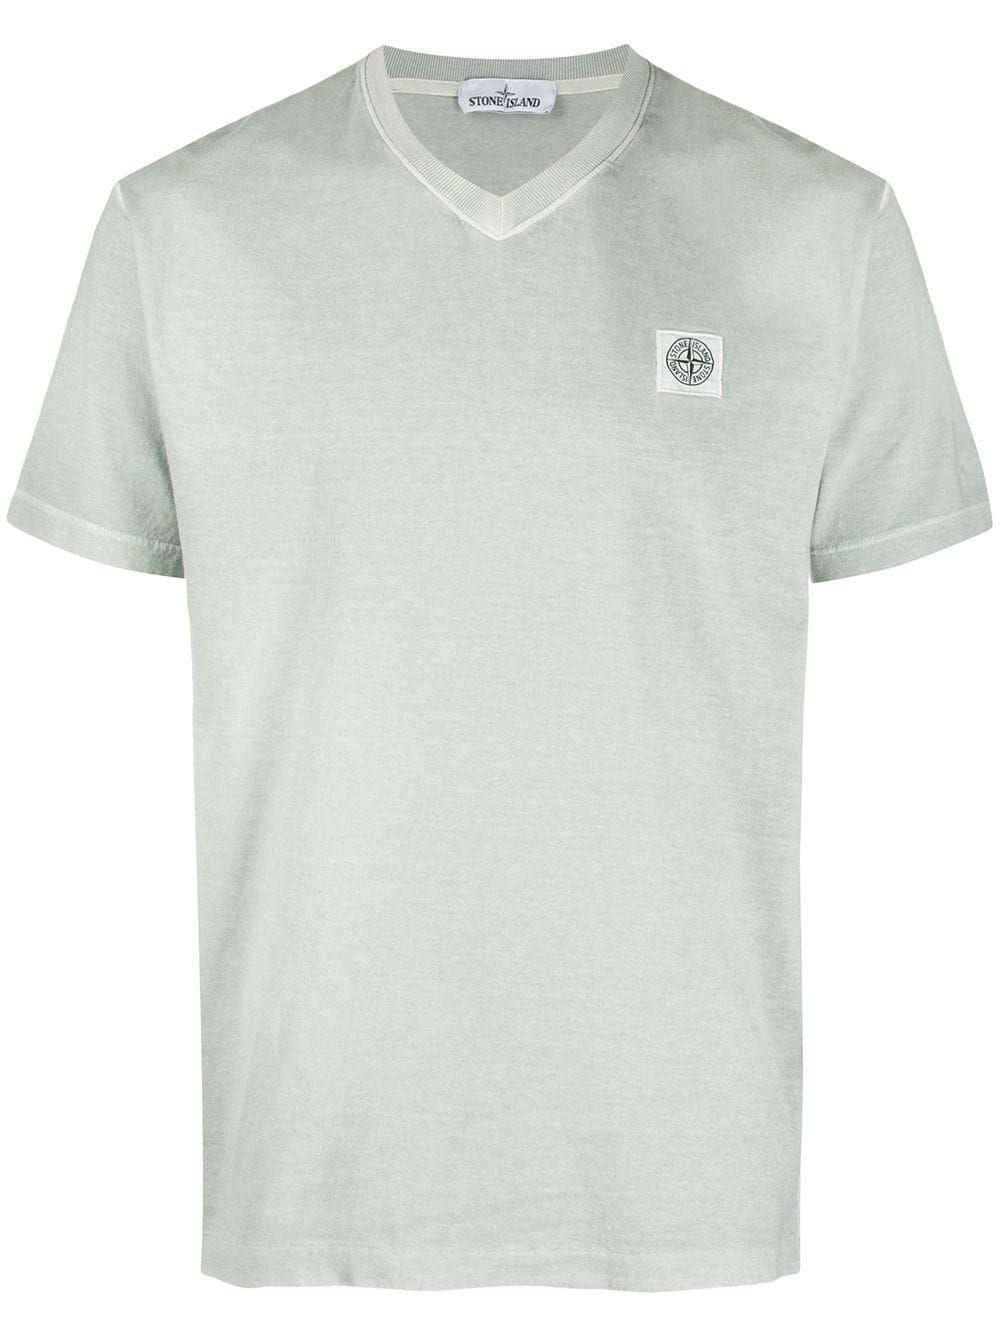 Stone Island Stone Island Logo Patch T Shirt Green Stoneisland Cloth Stone Island T Shirt Mens Tops